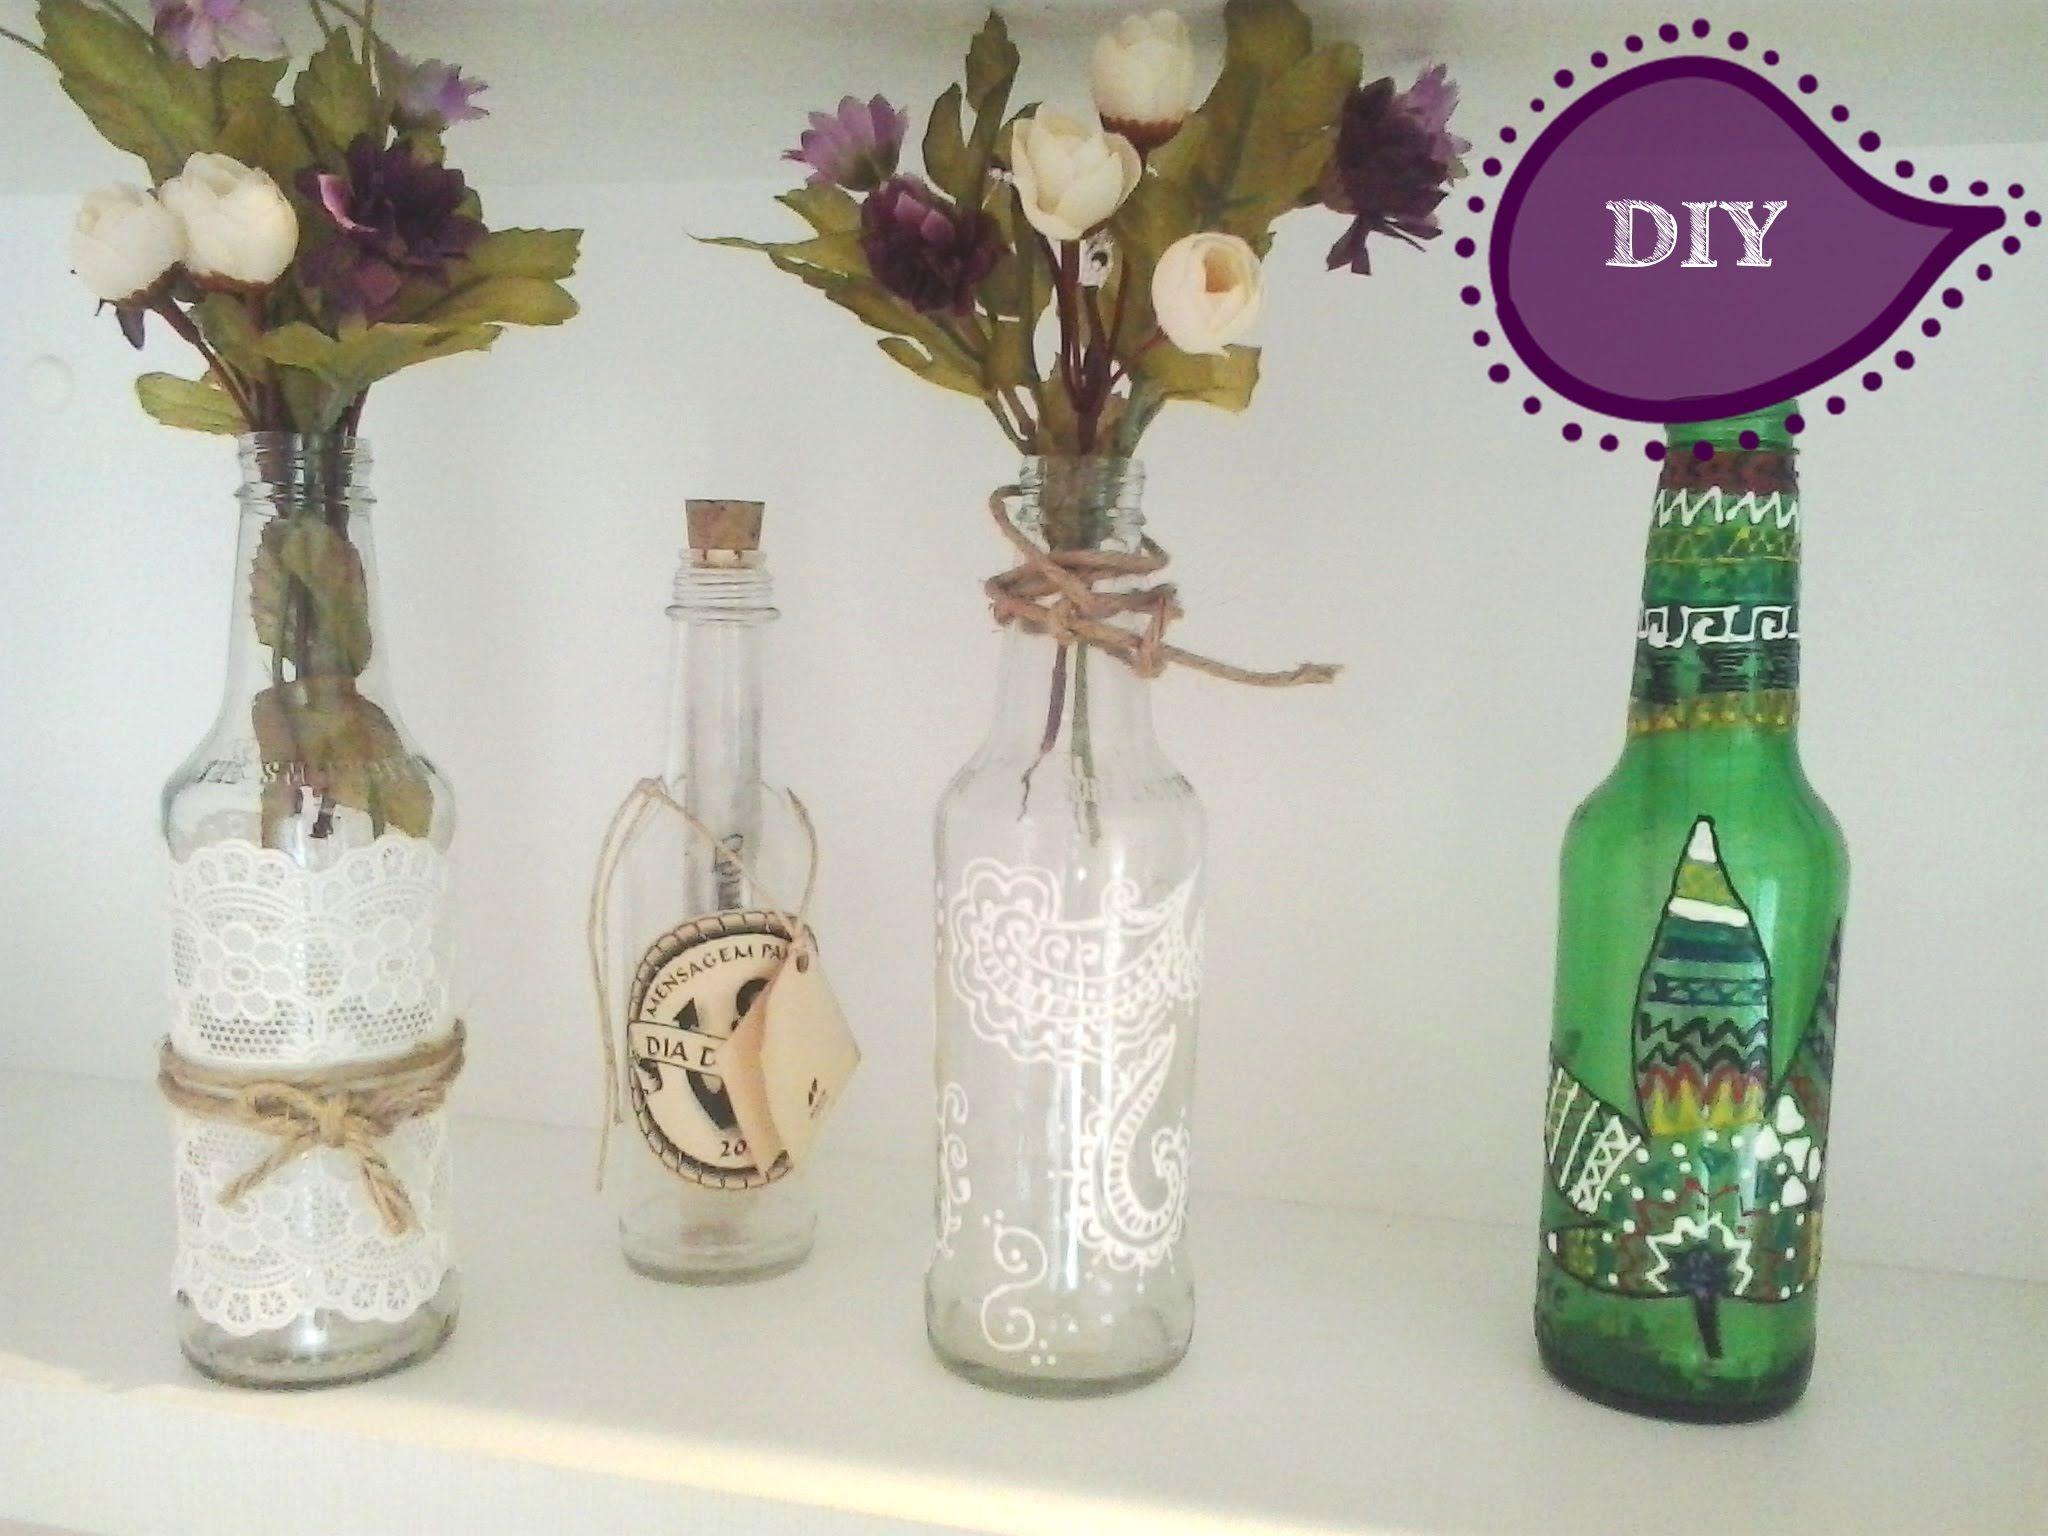 DIY Faa decorao com garrafas de vidro